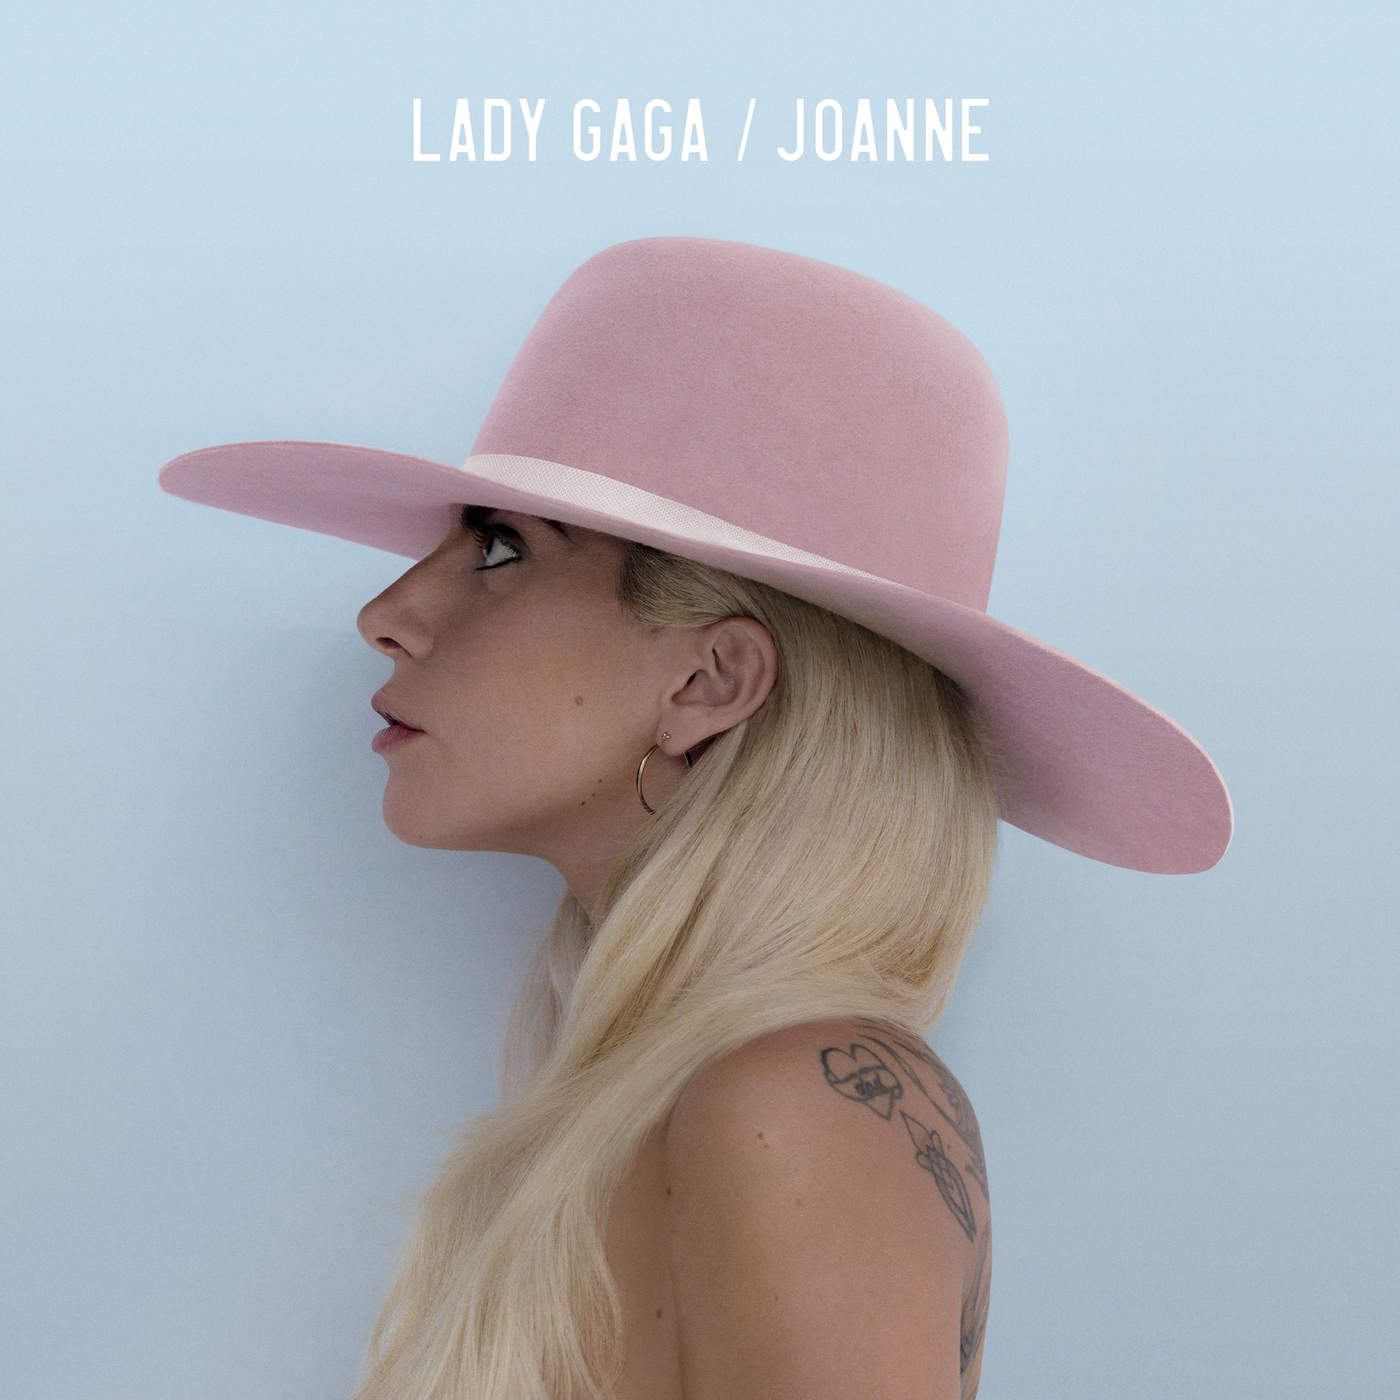 Lady Gaga - Million Reasons - Single Cover